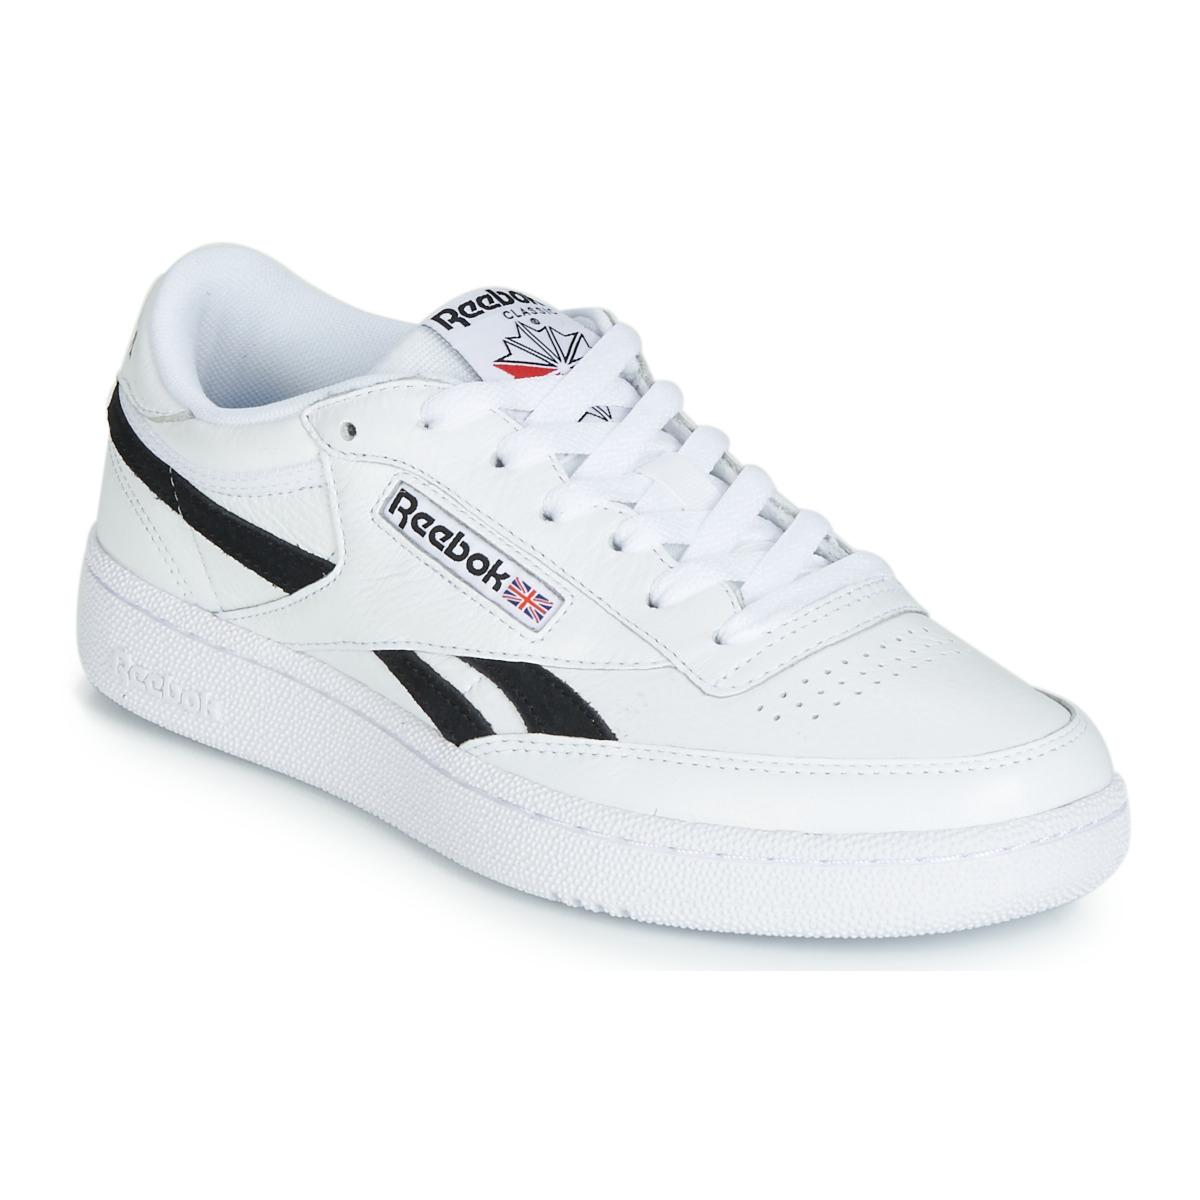 7d85831ec Reebok Revenge Plus Mu Men s Shoes (trainers) In White in White for ...